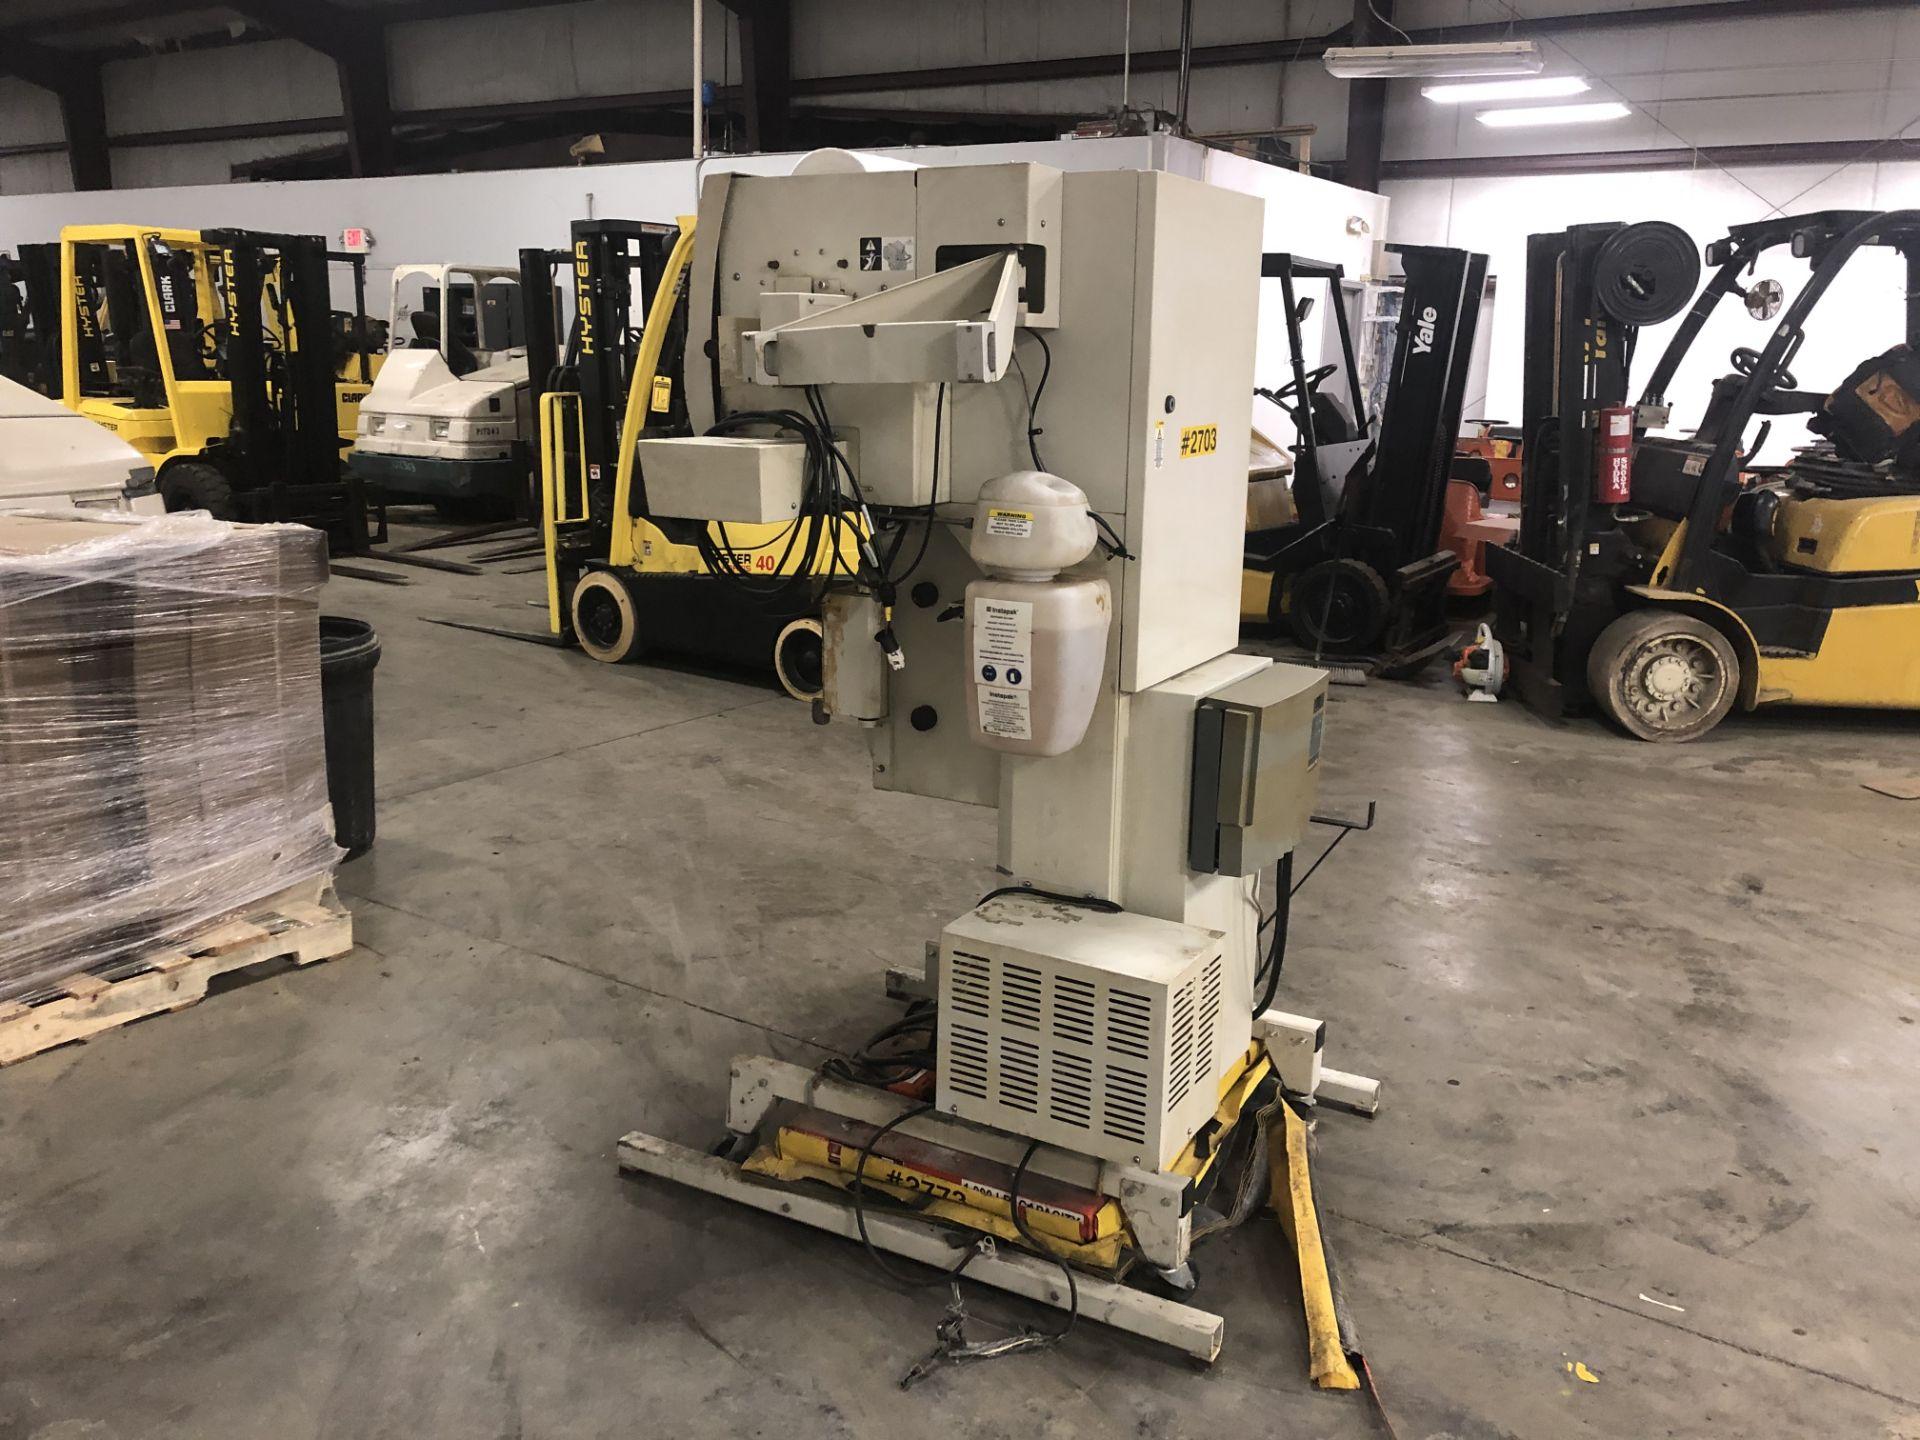 Lot 34 - 2013 Sealed Air Instapak iMold Foam Packaging Machine, Serial Number: 901–26520